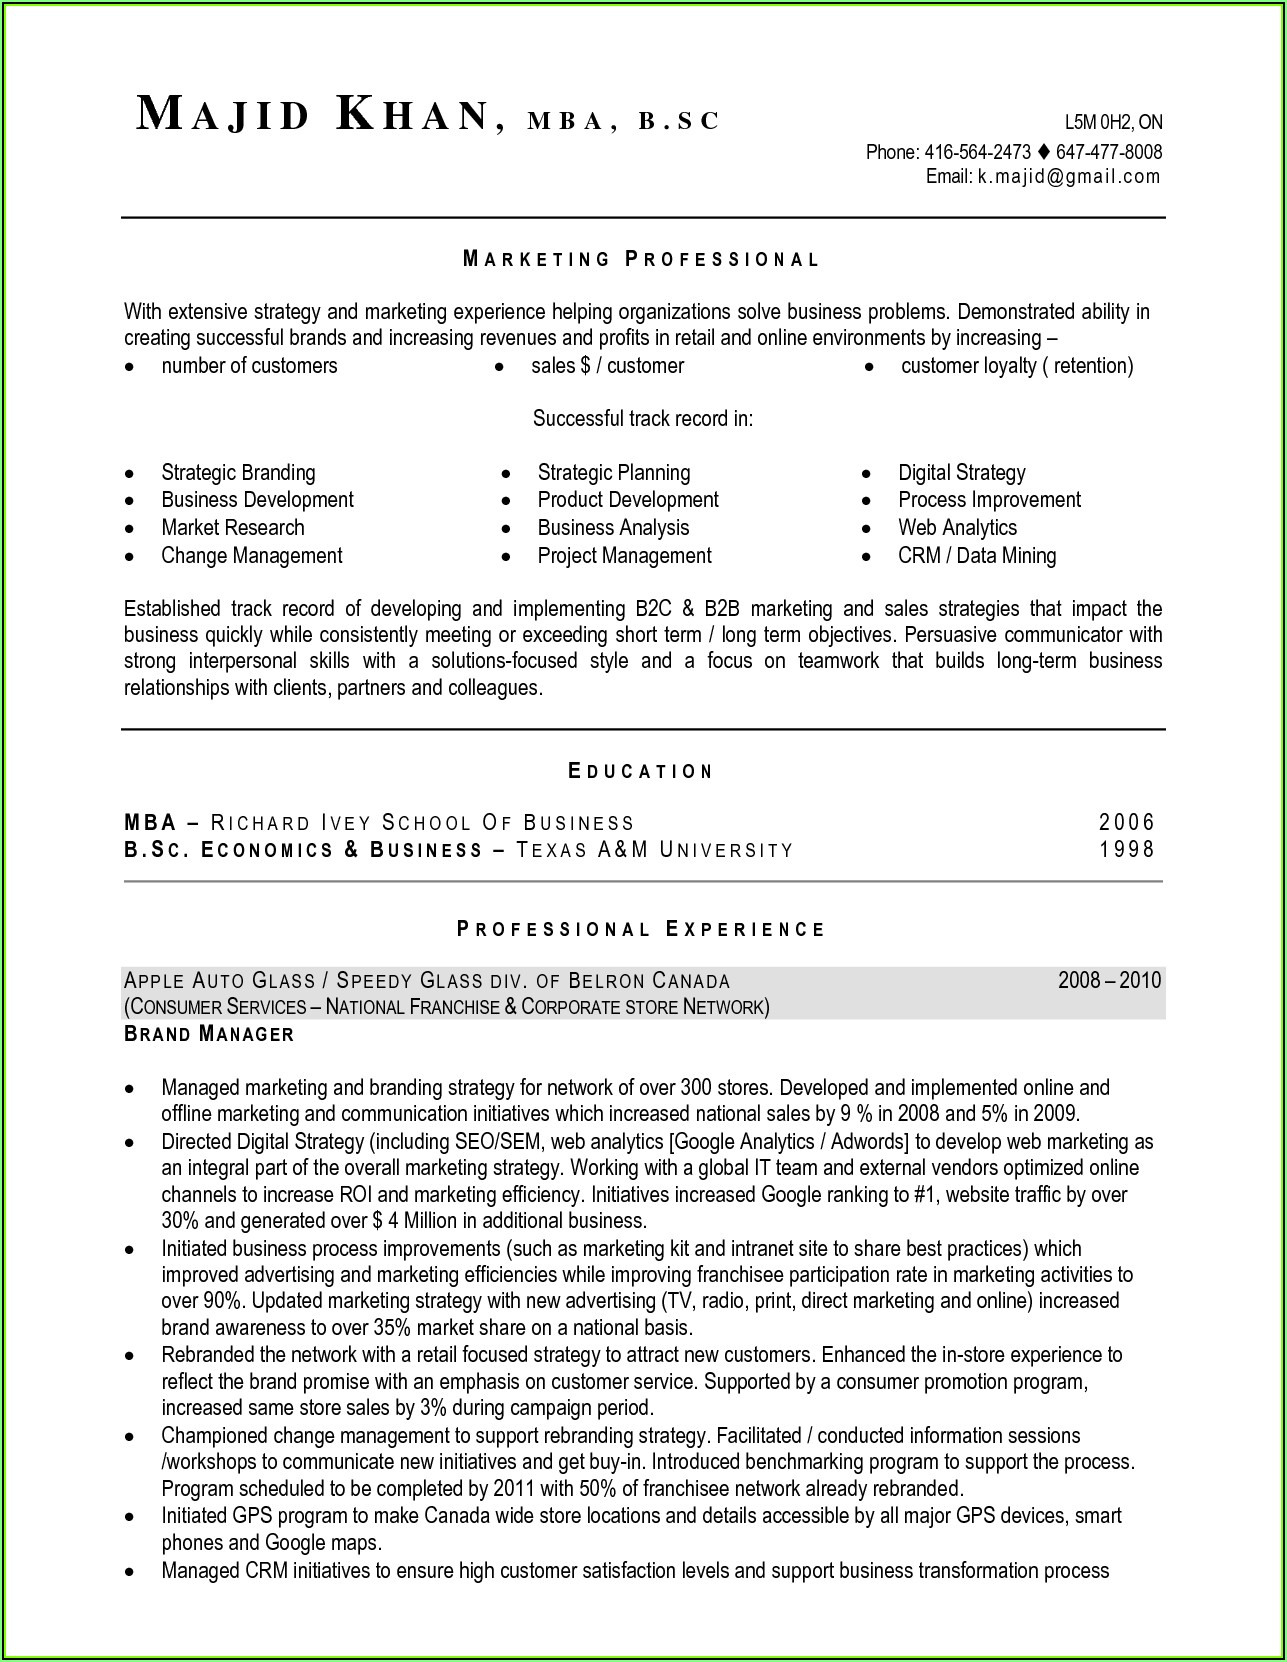 Resume Template Canada Free